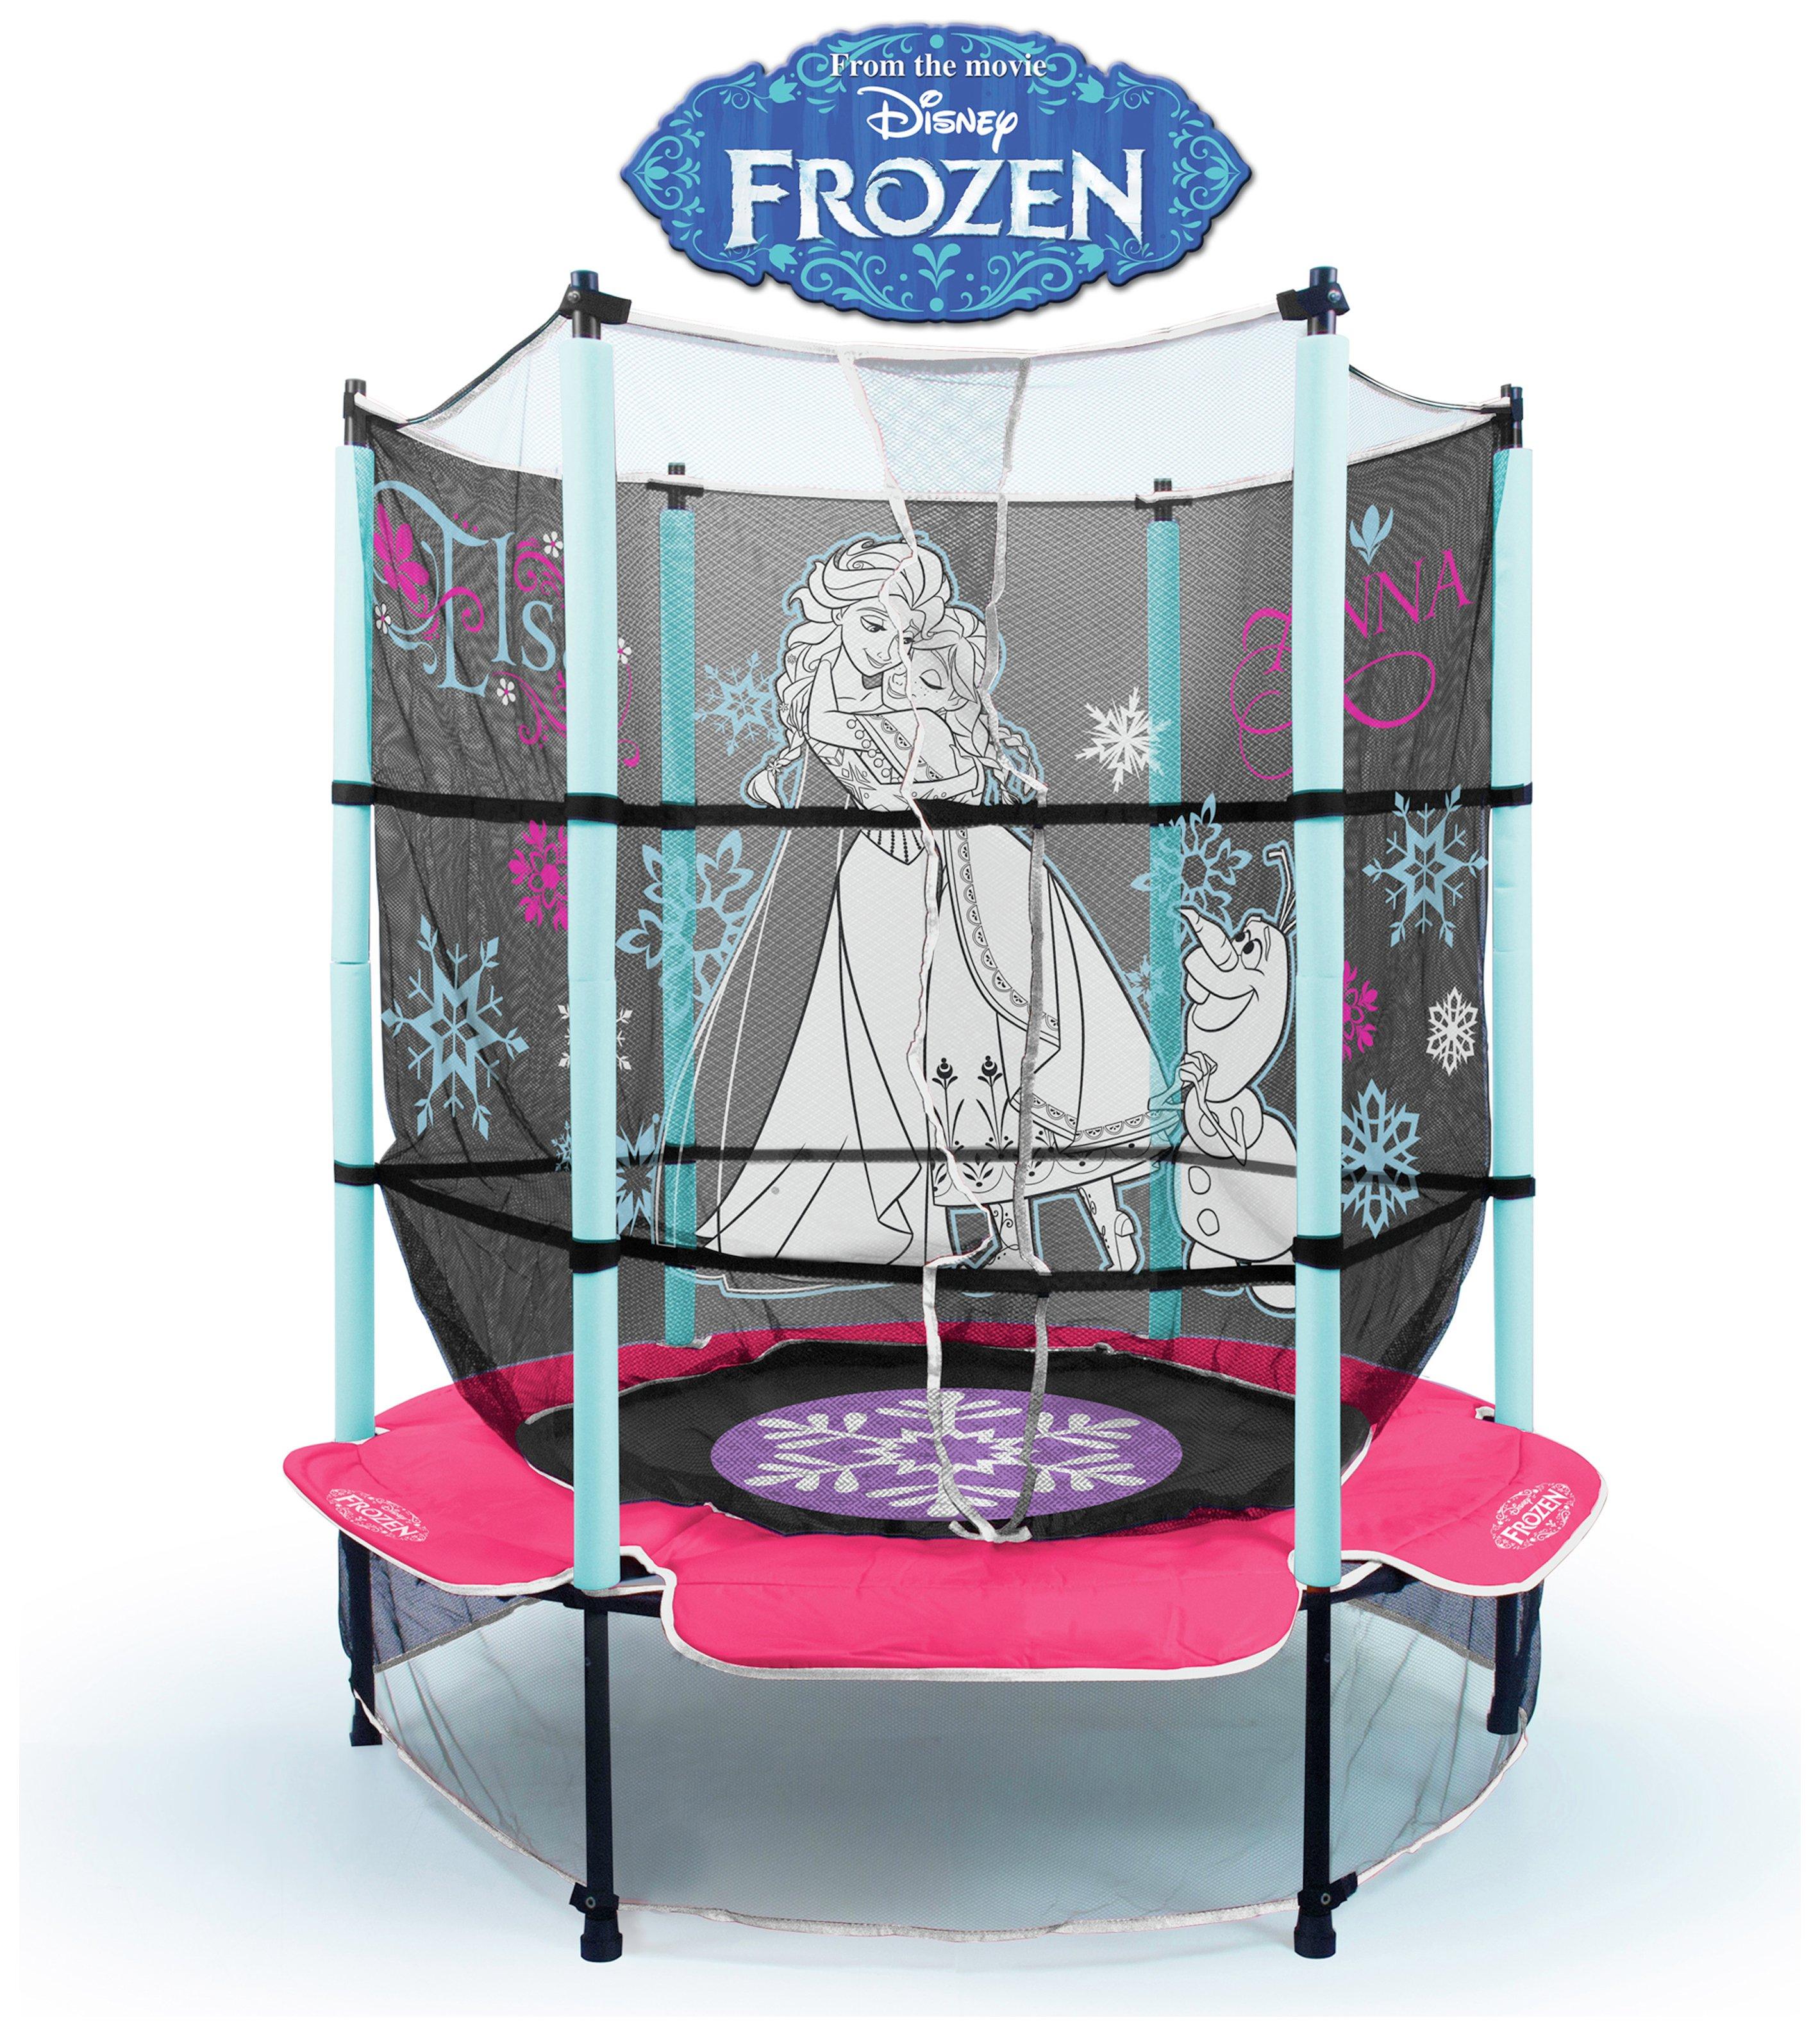 Image of Frozen Trampoline.